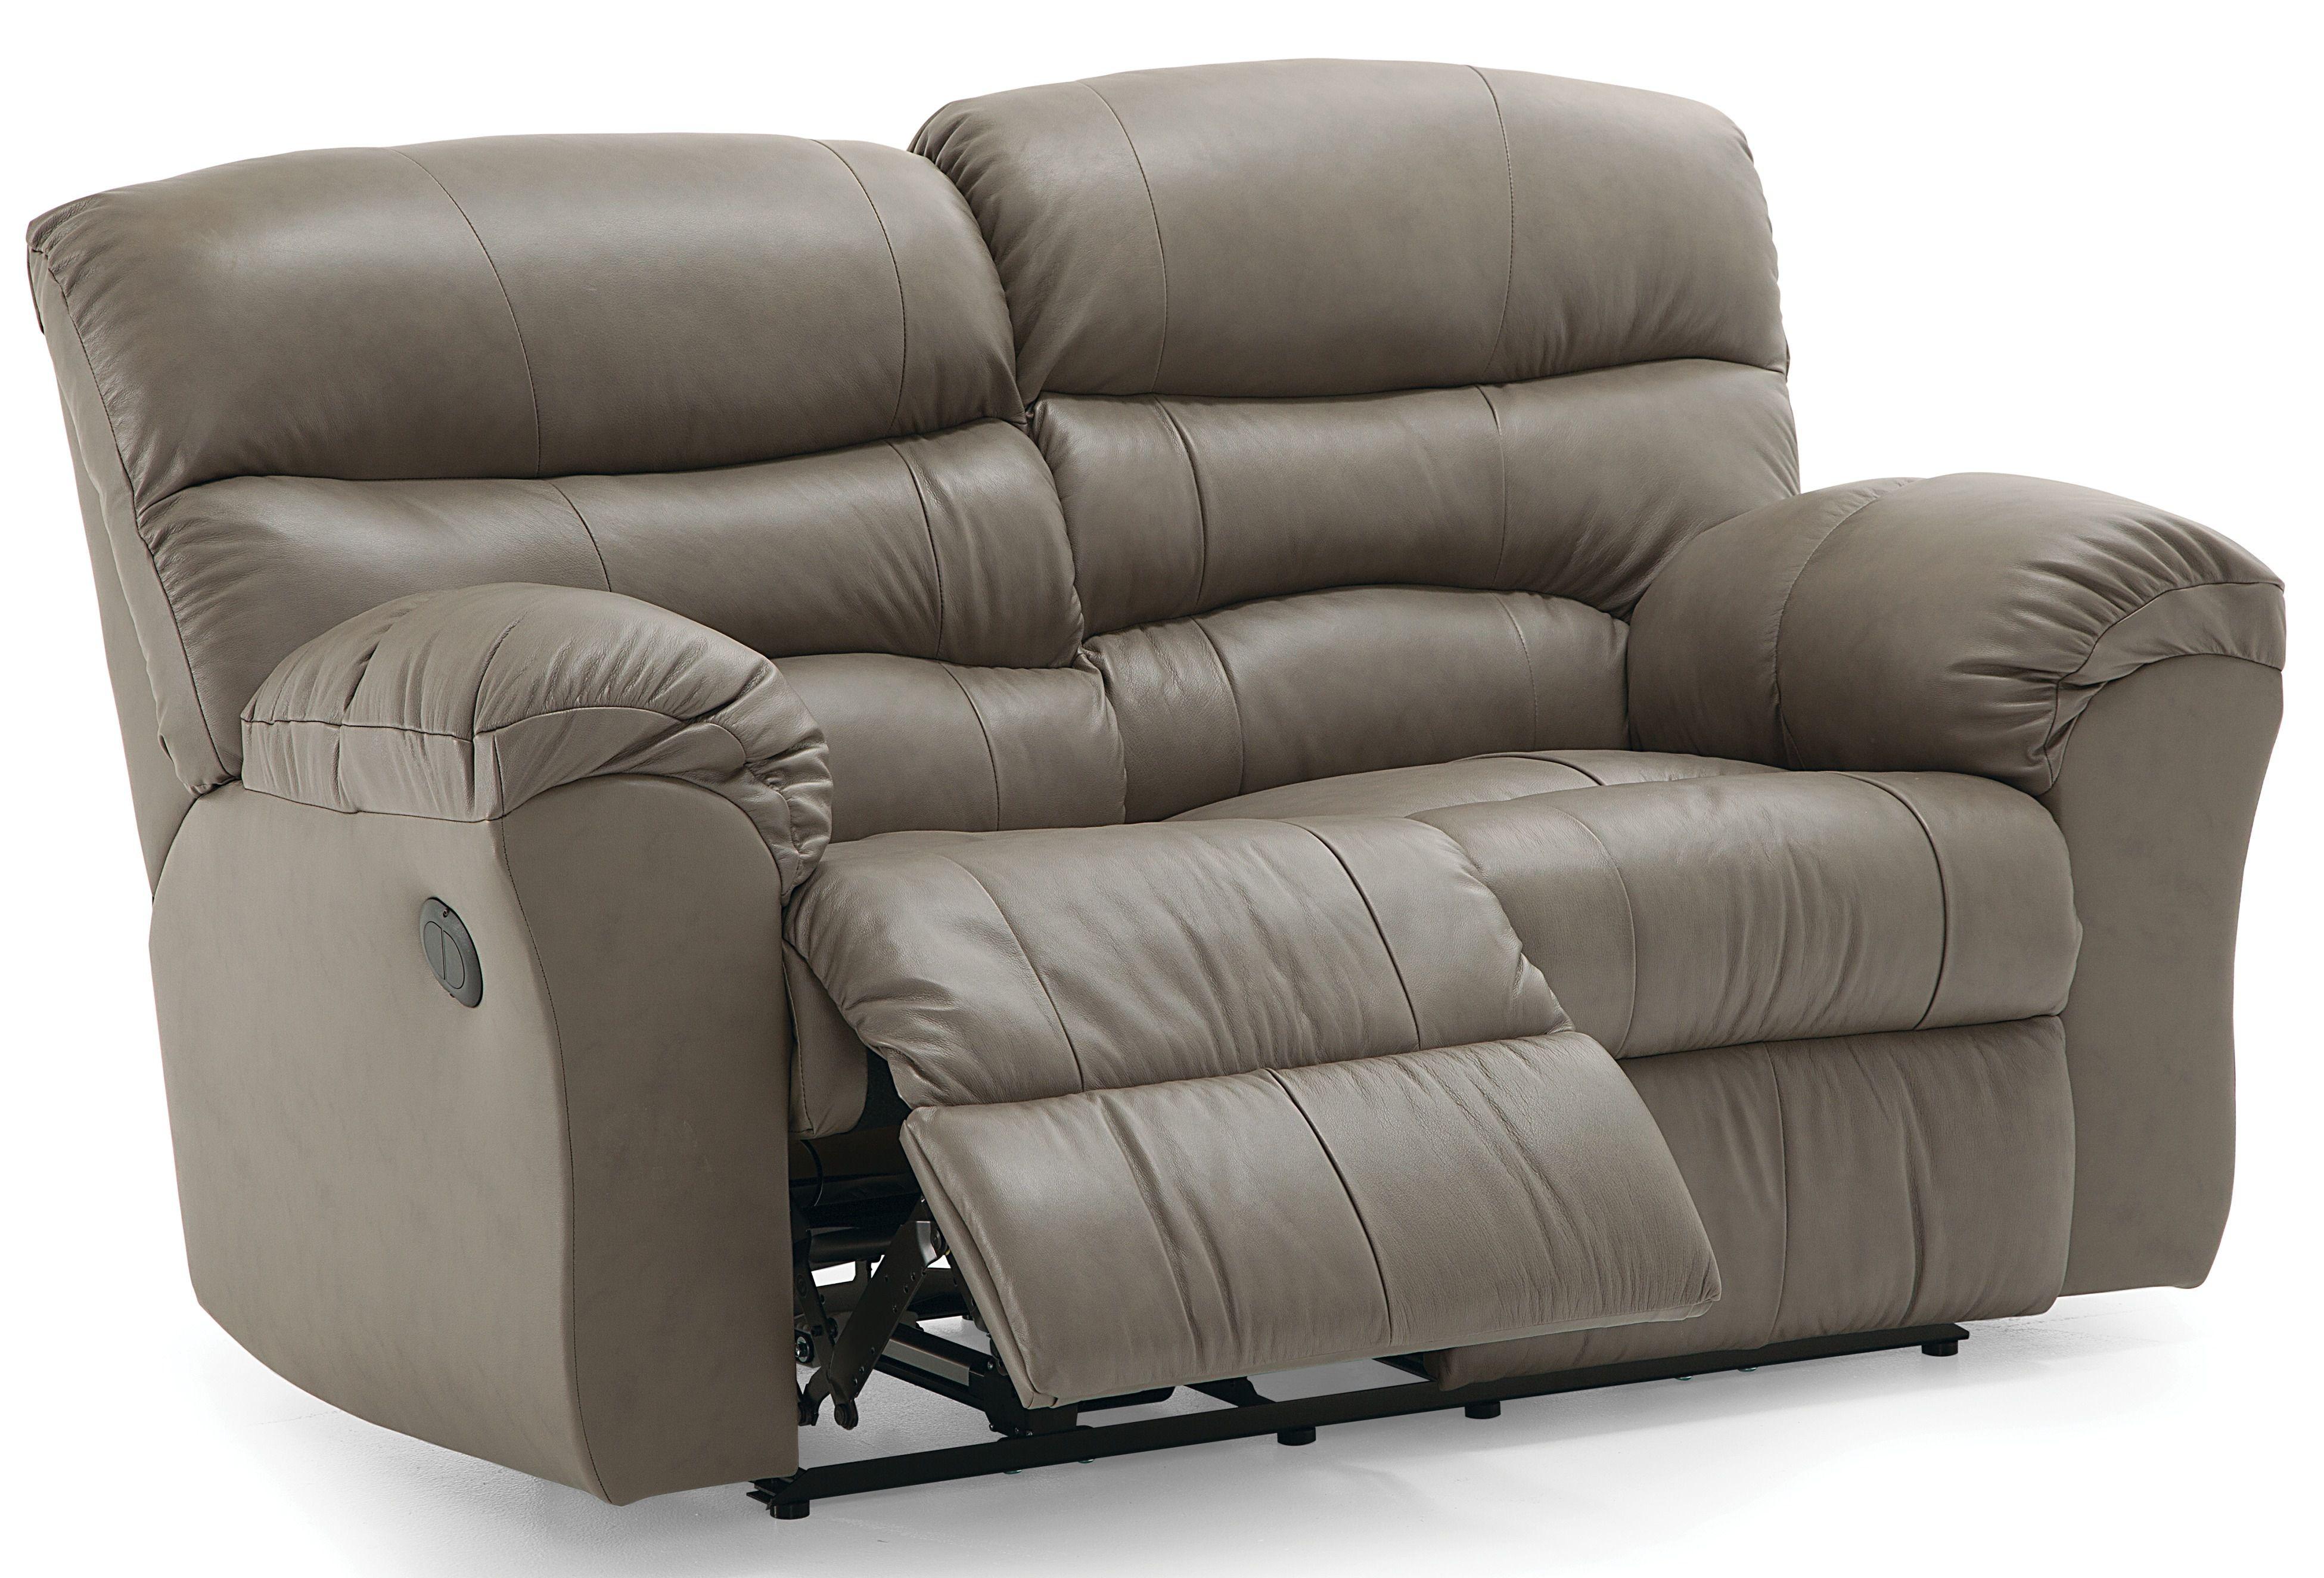 Palliser Furniture Loveseat Recliner Power 41098 63